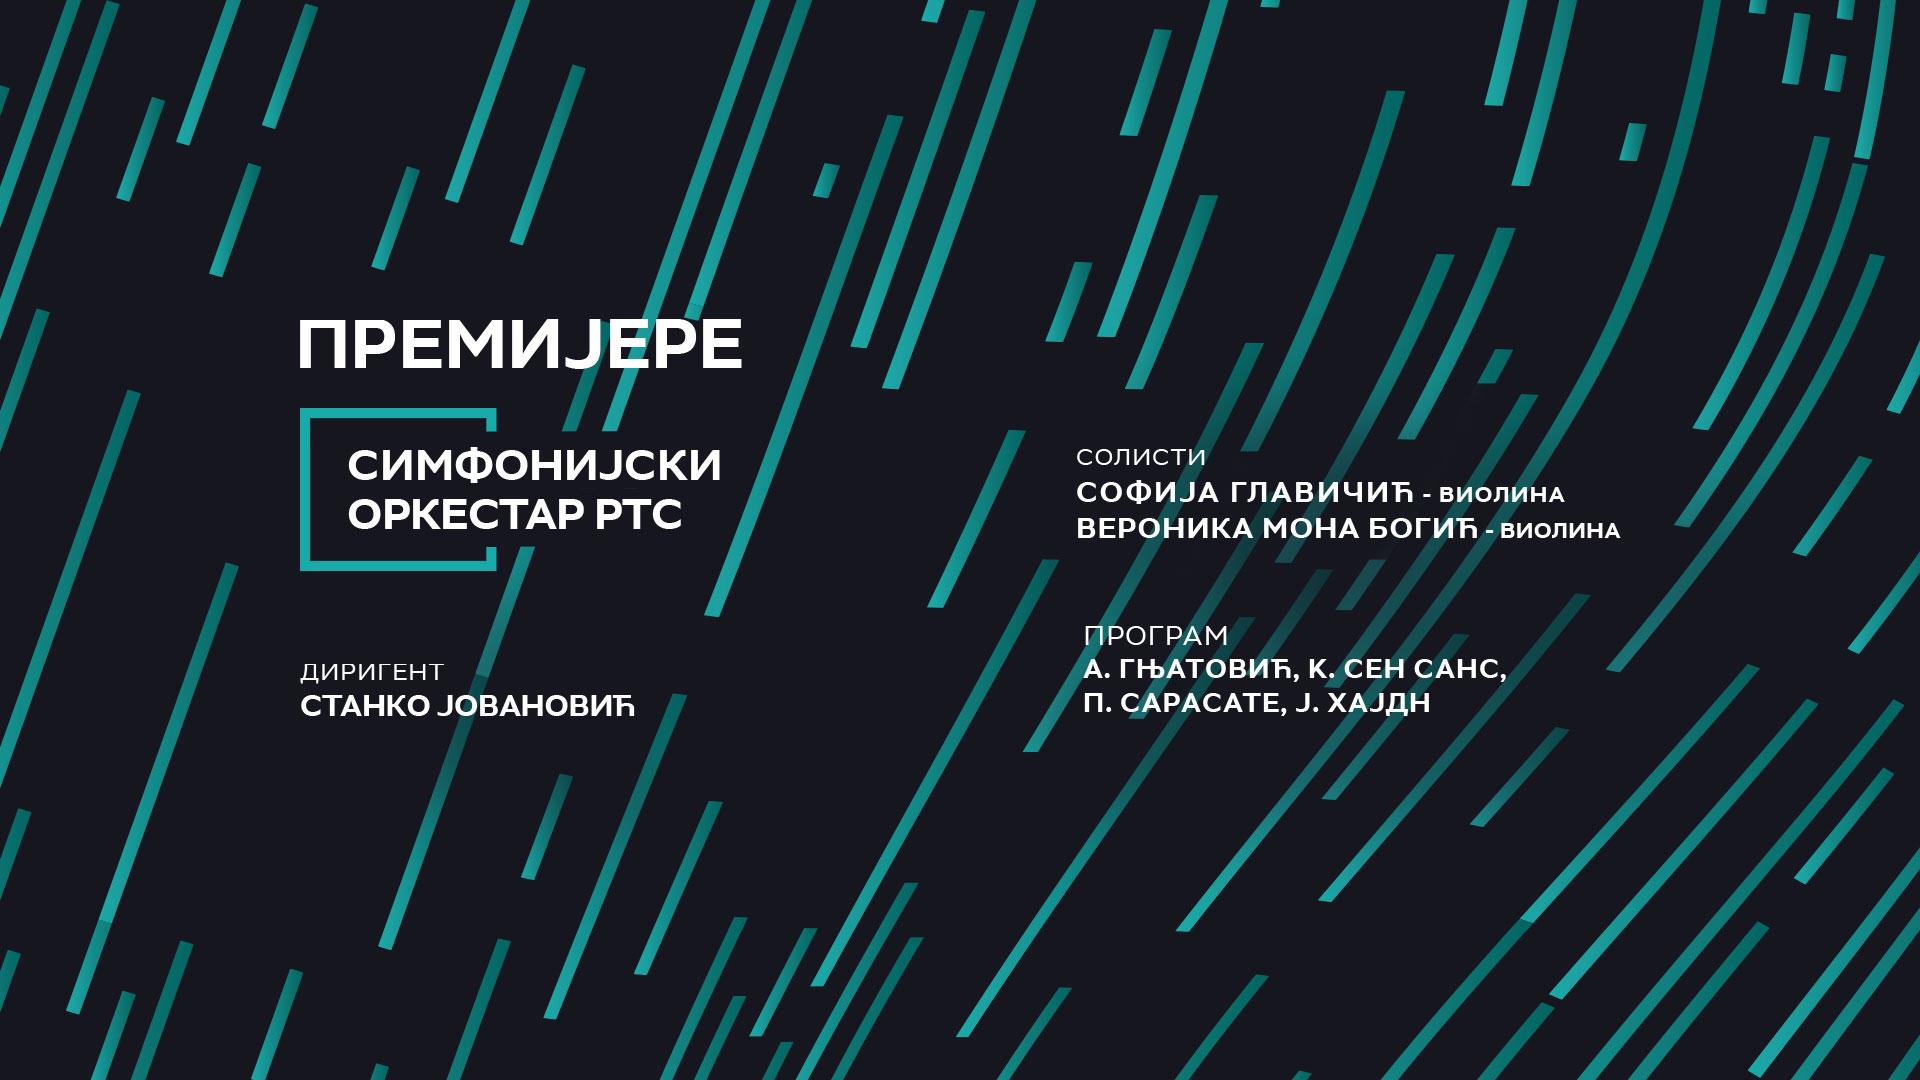 """THE GAME OF LIFE"" ANE GNJATOVIĆ PREMIJERNO NA KONCERTU SIMFONIJSKOG ORKESTRA RTS"